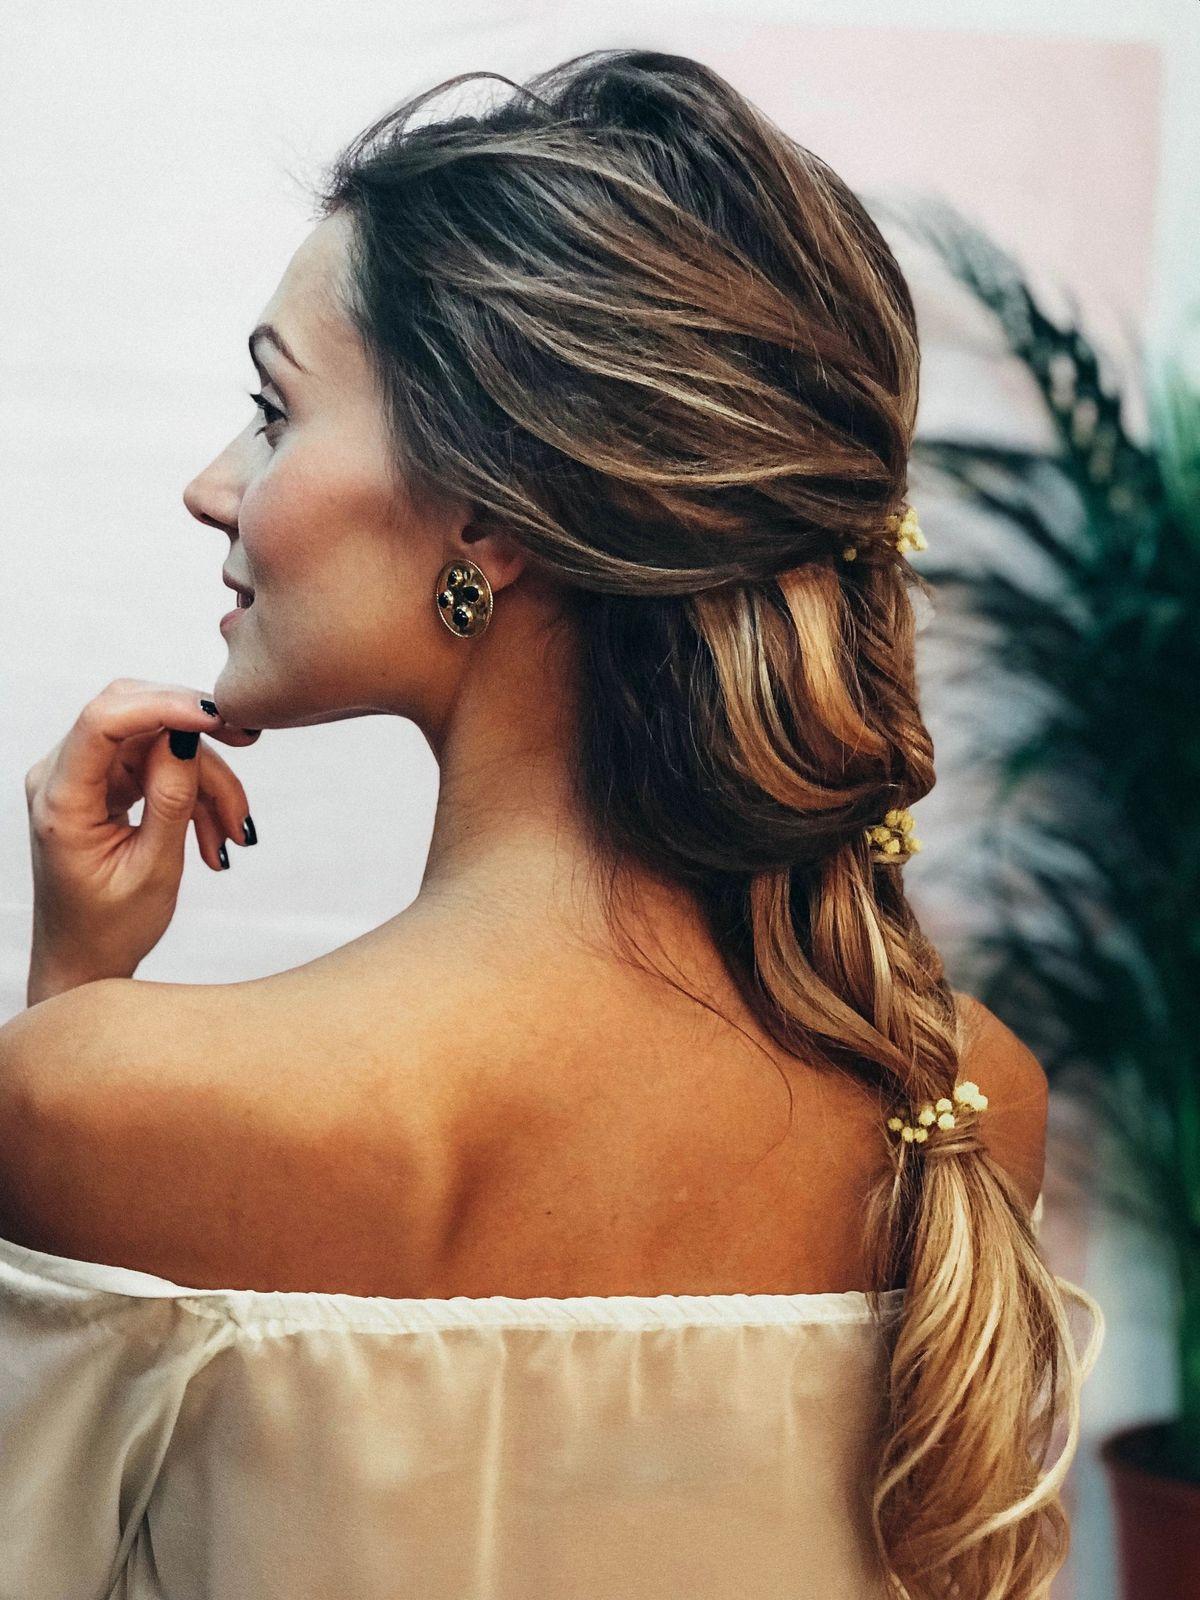 Hair Inspiration 2019-03-28 01:25:07